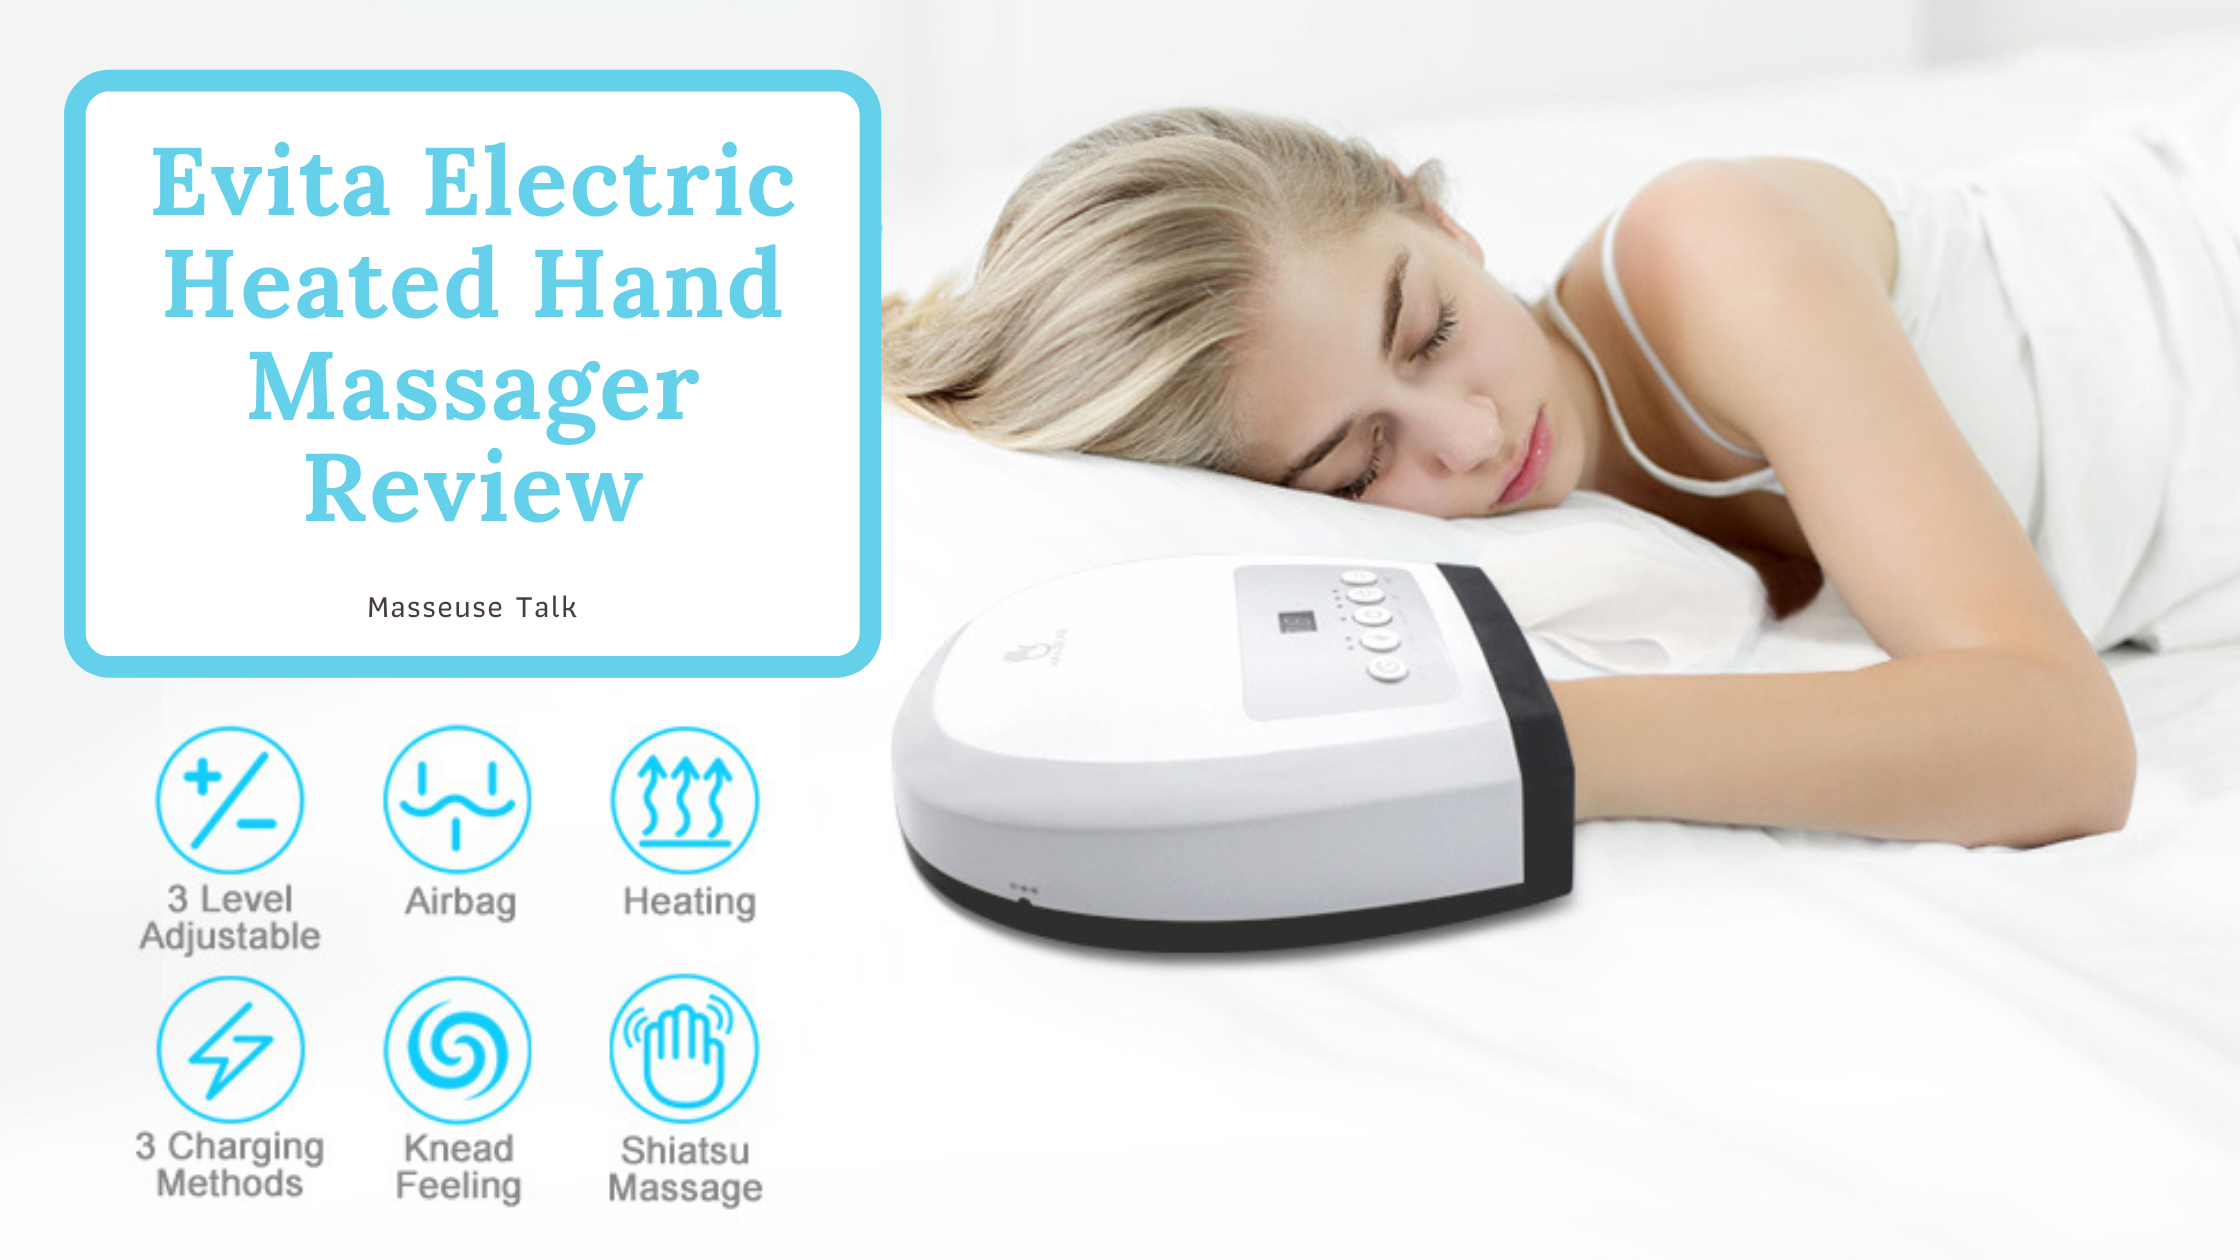 Evita Electric Hand Massager